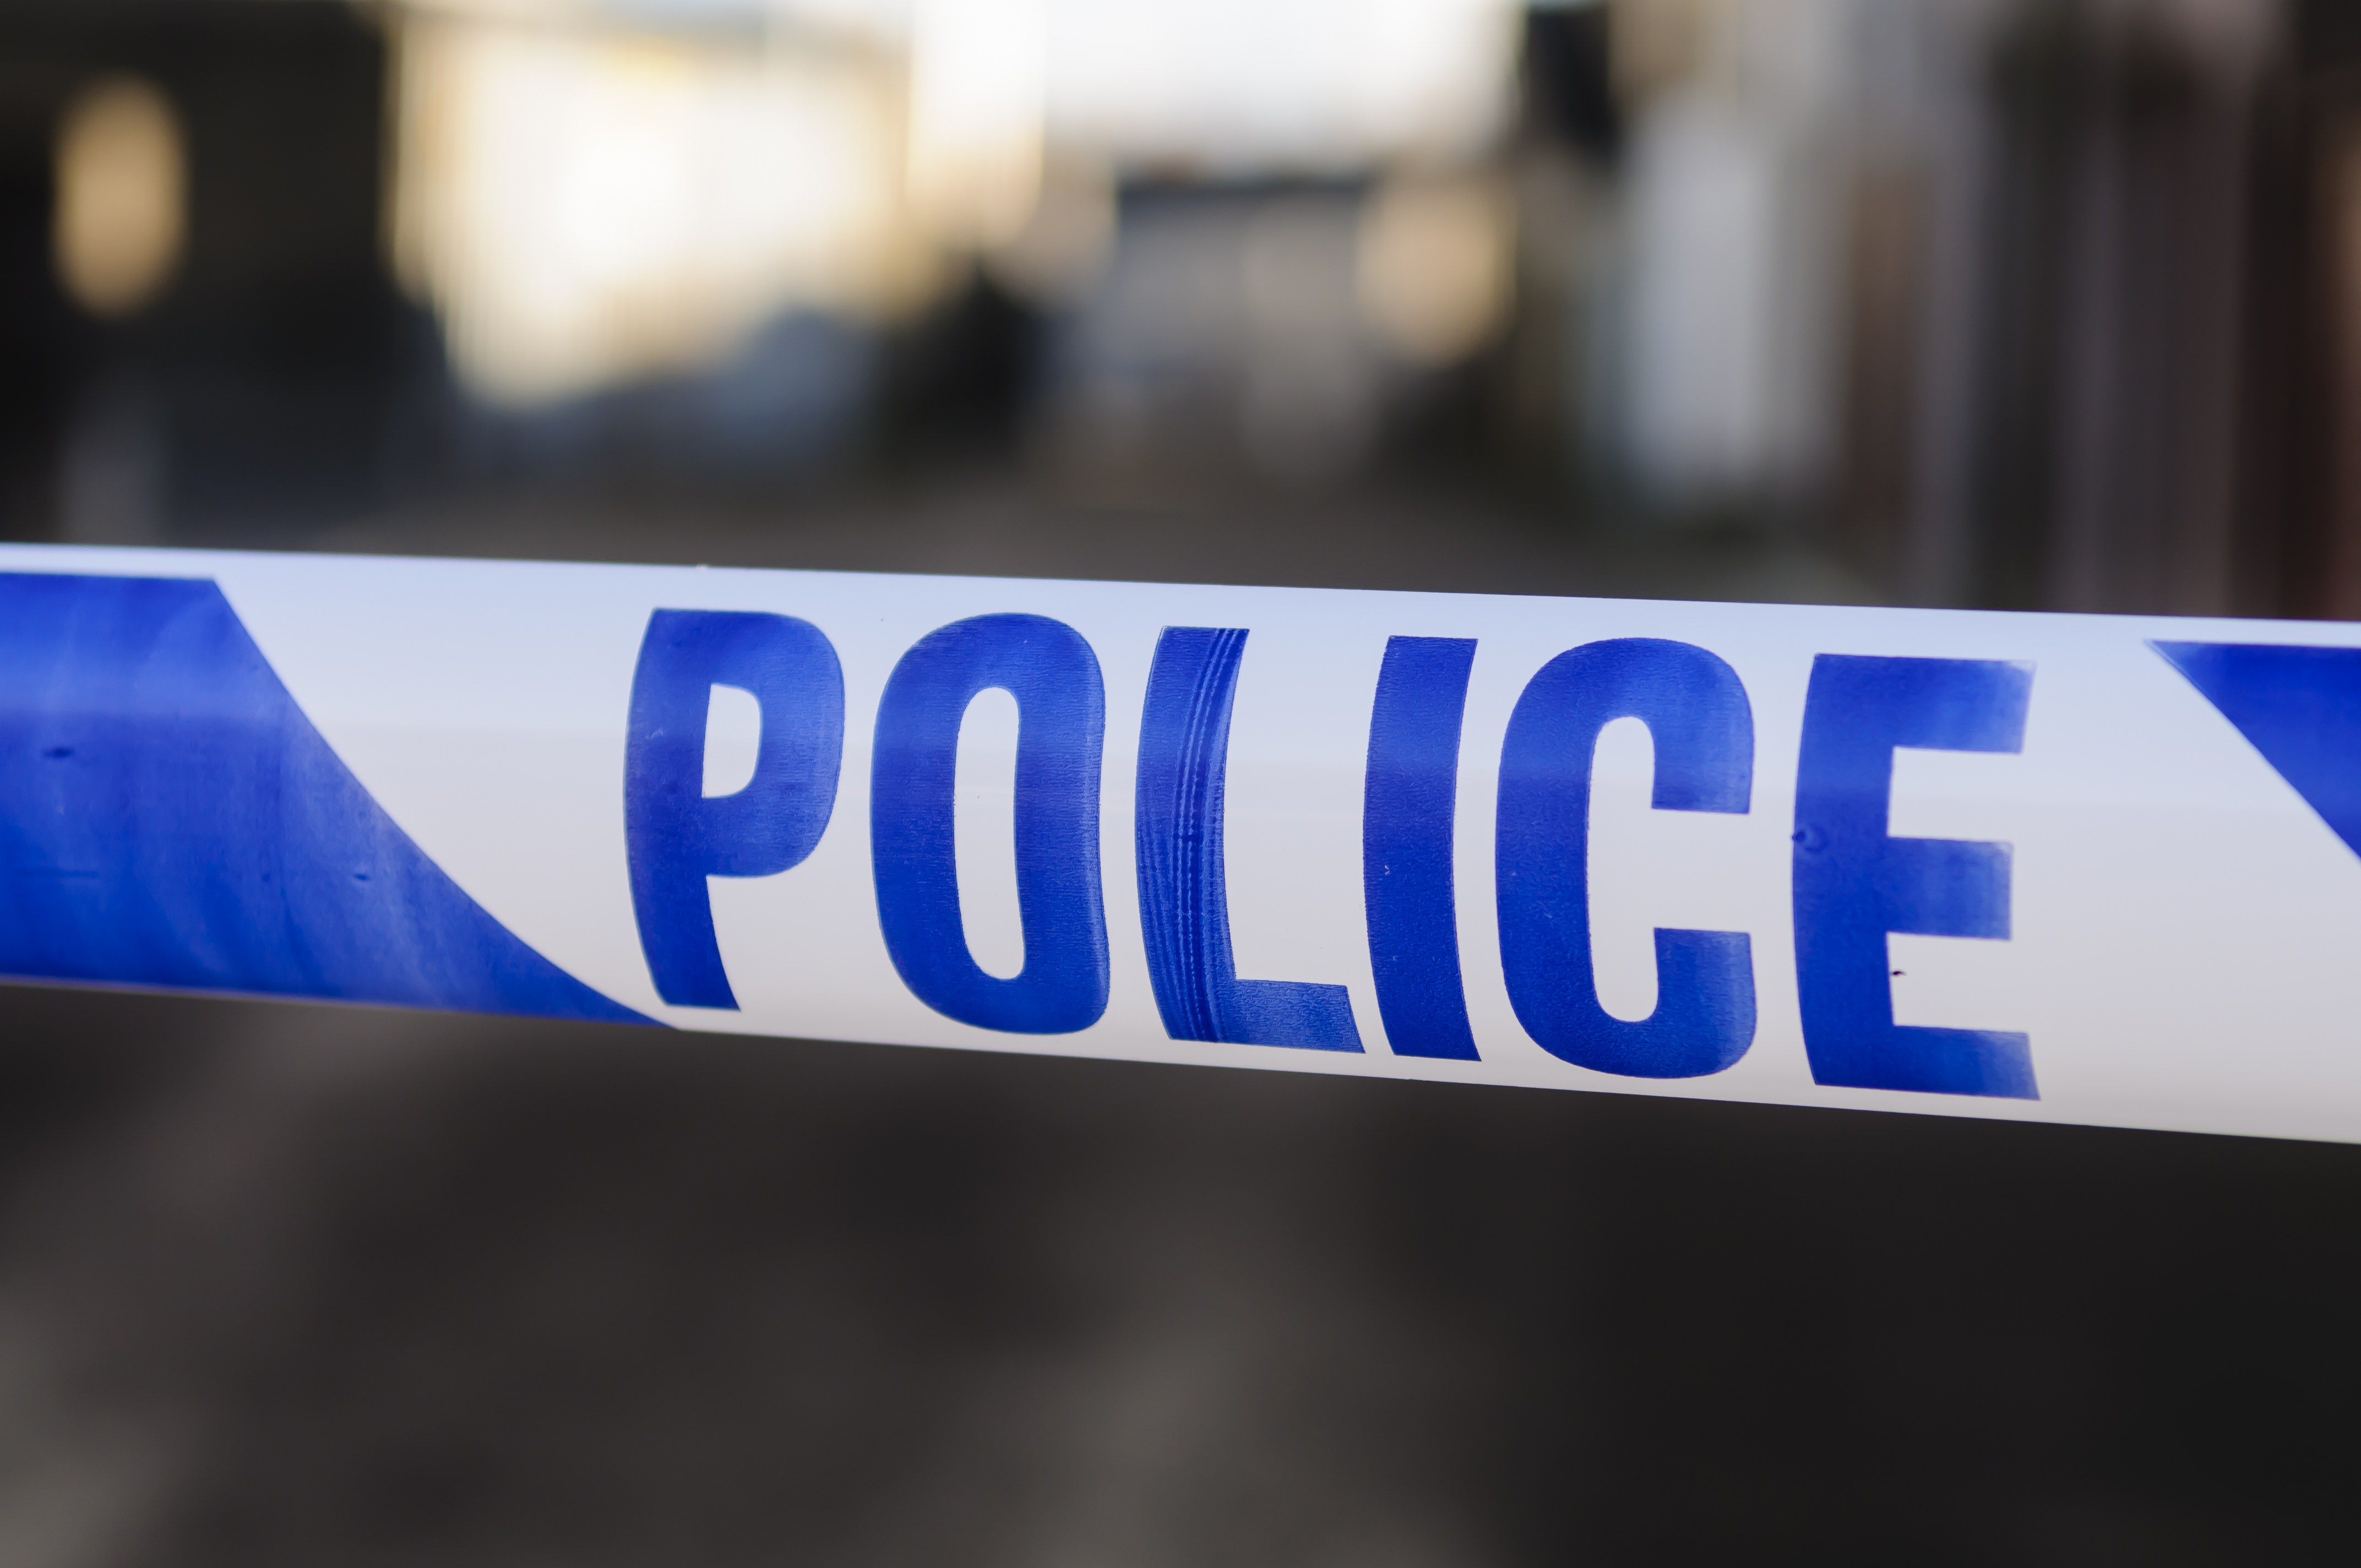 Police tape at the cordon across a crime scene